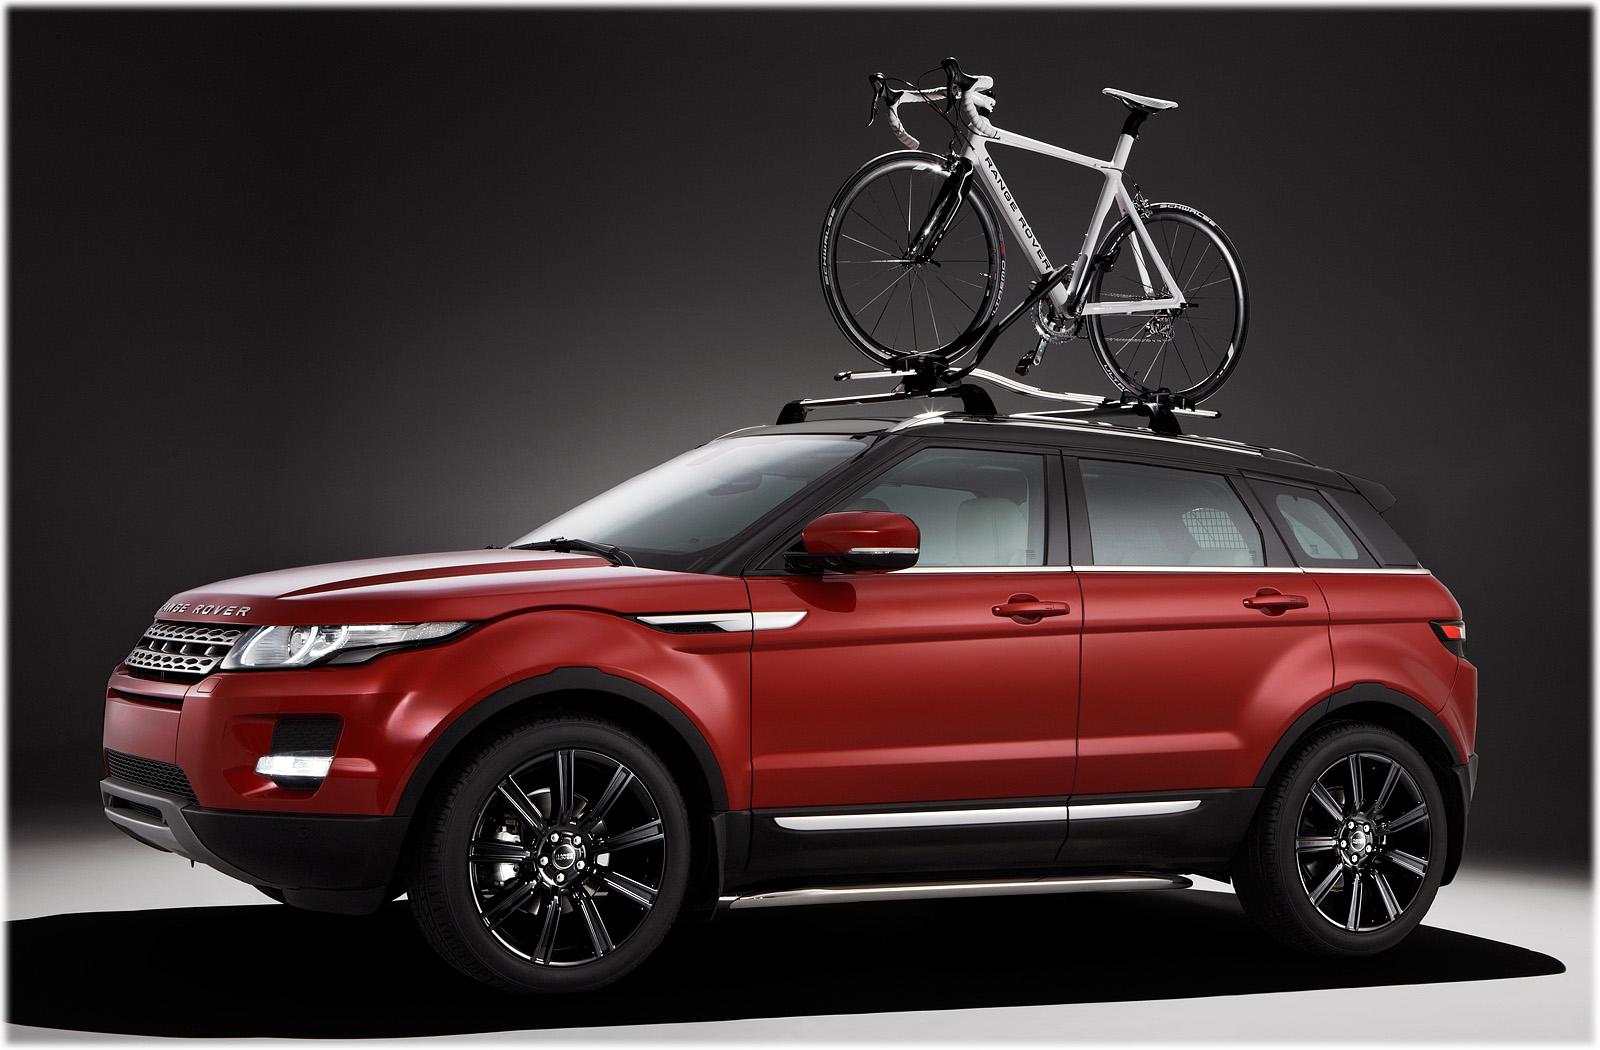 http://www.bike-trend.com/wp-content/uploads/2011/06/range-rover-evoque-concept-bike-3.jpg